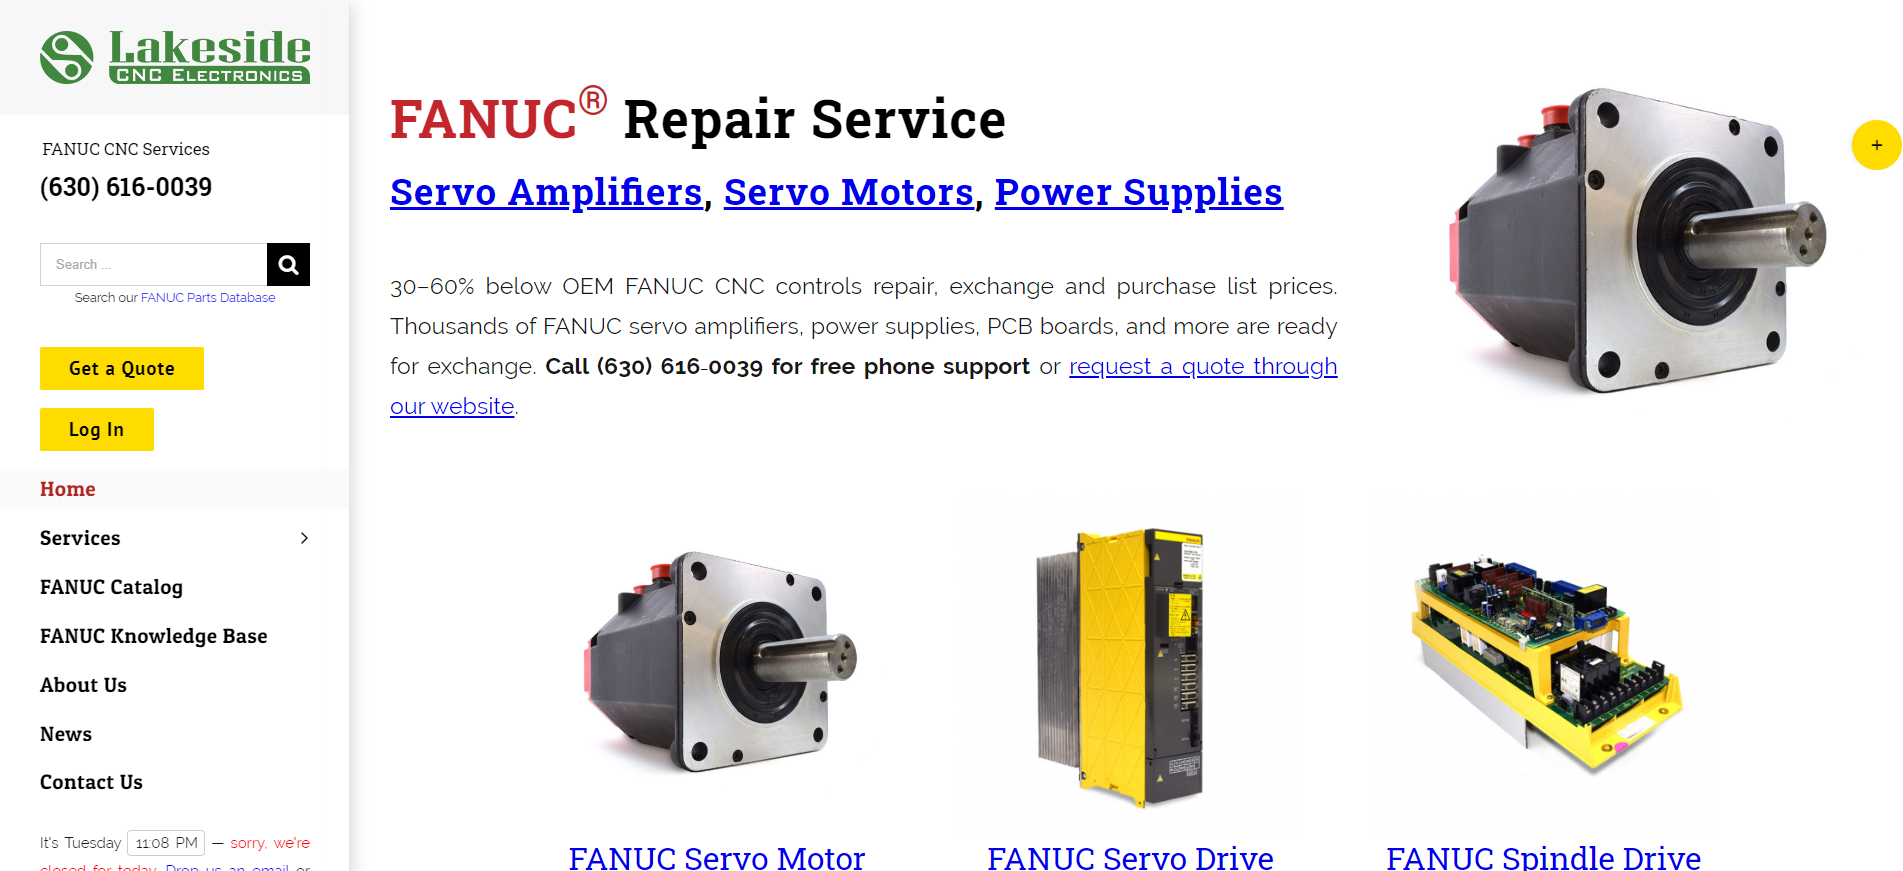 Lakeside CNC Group, Inc. New Website Version